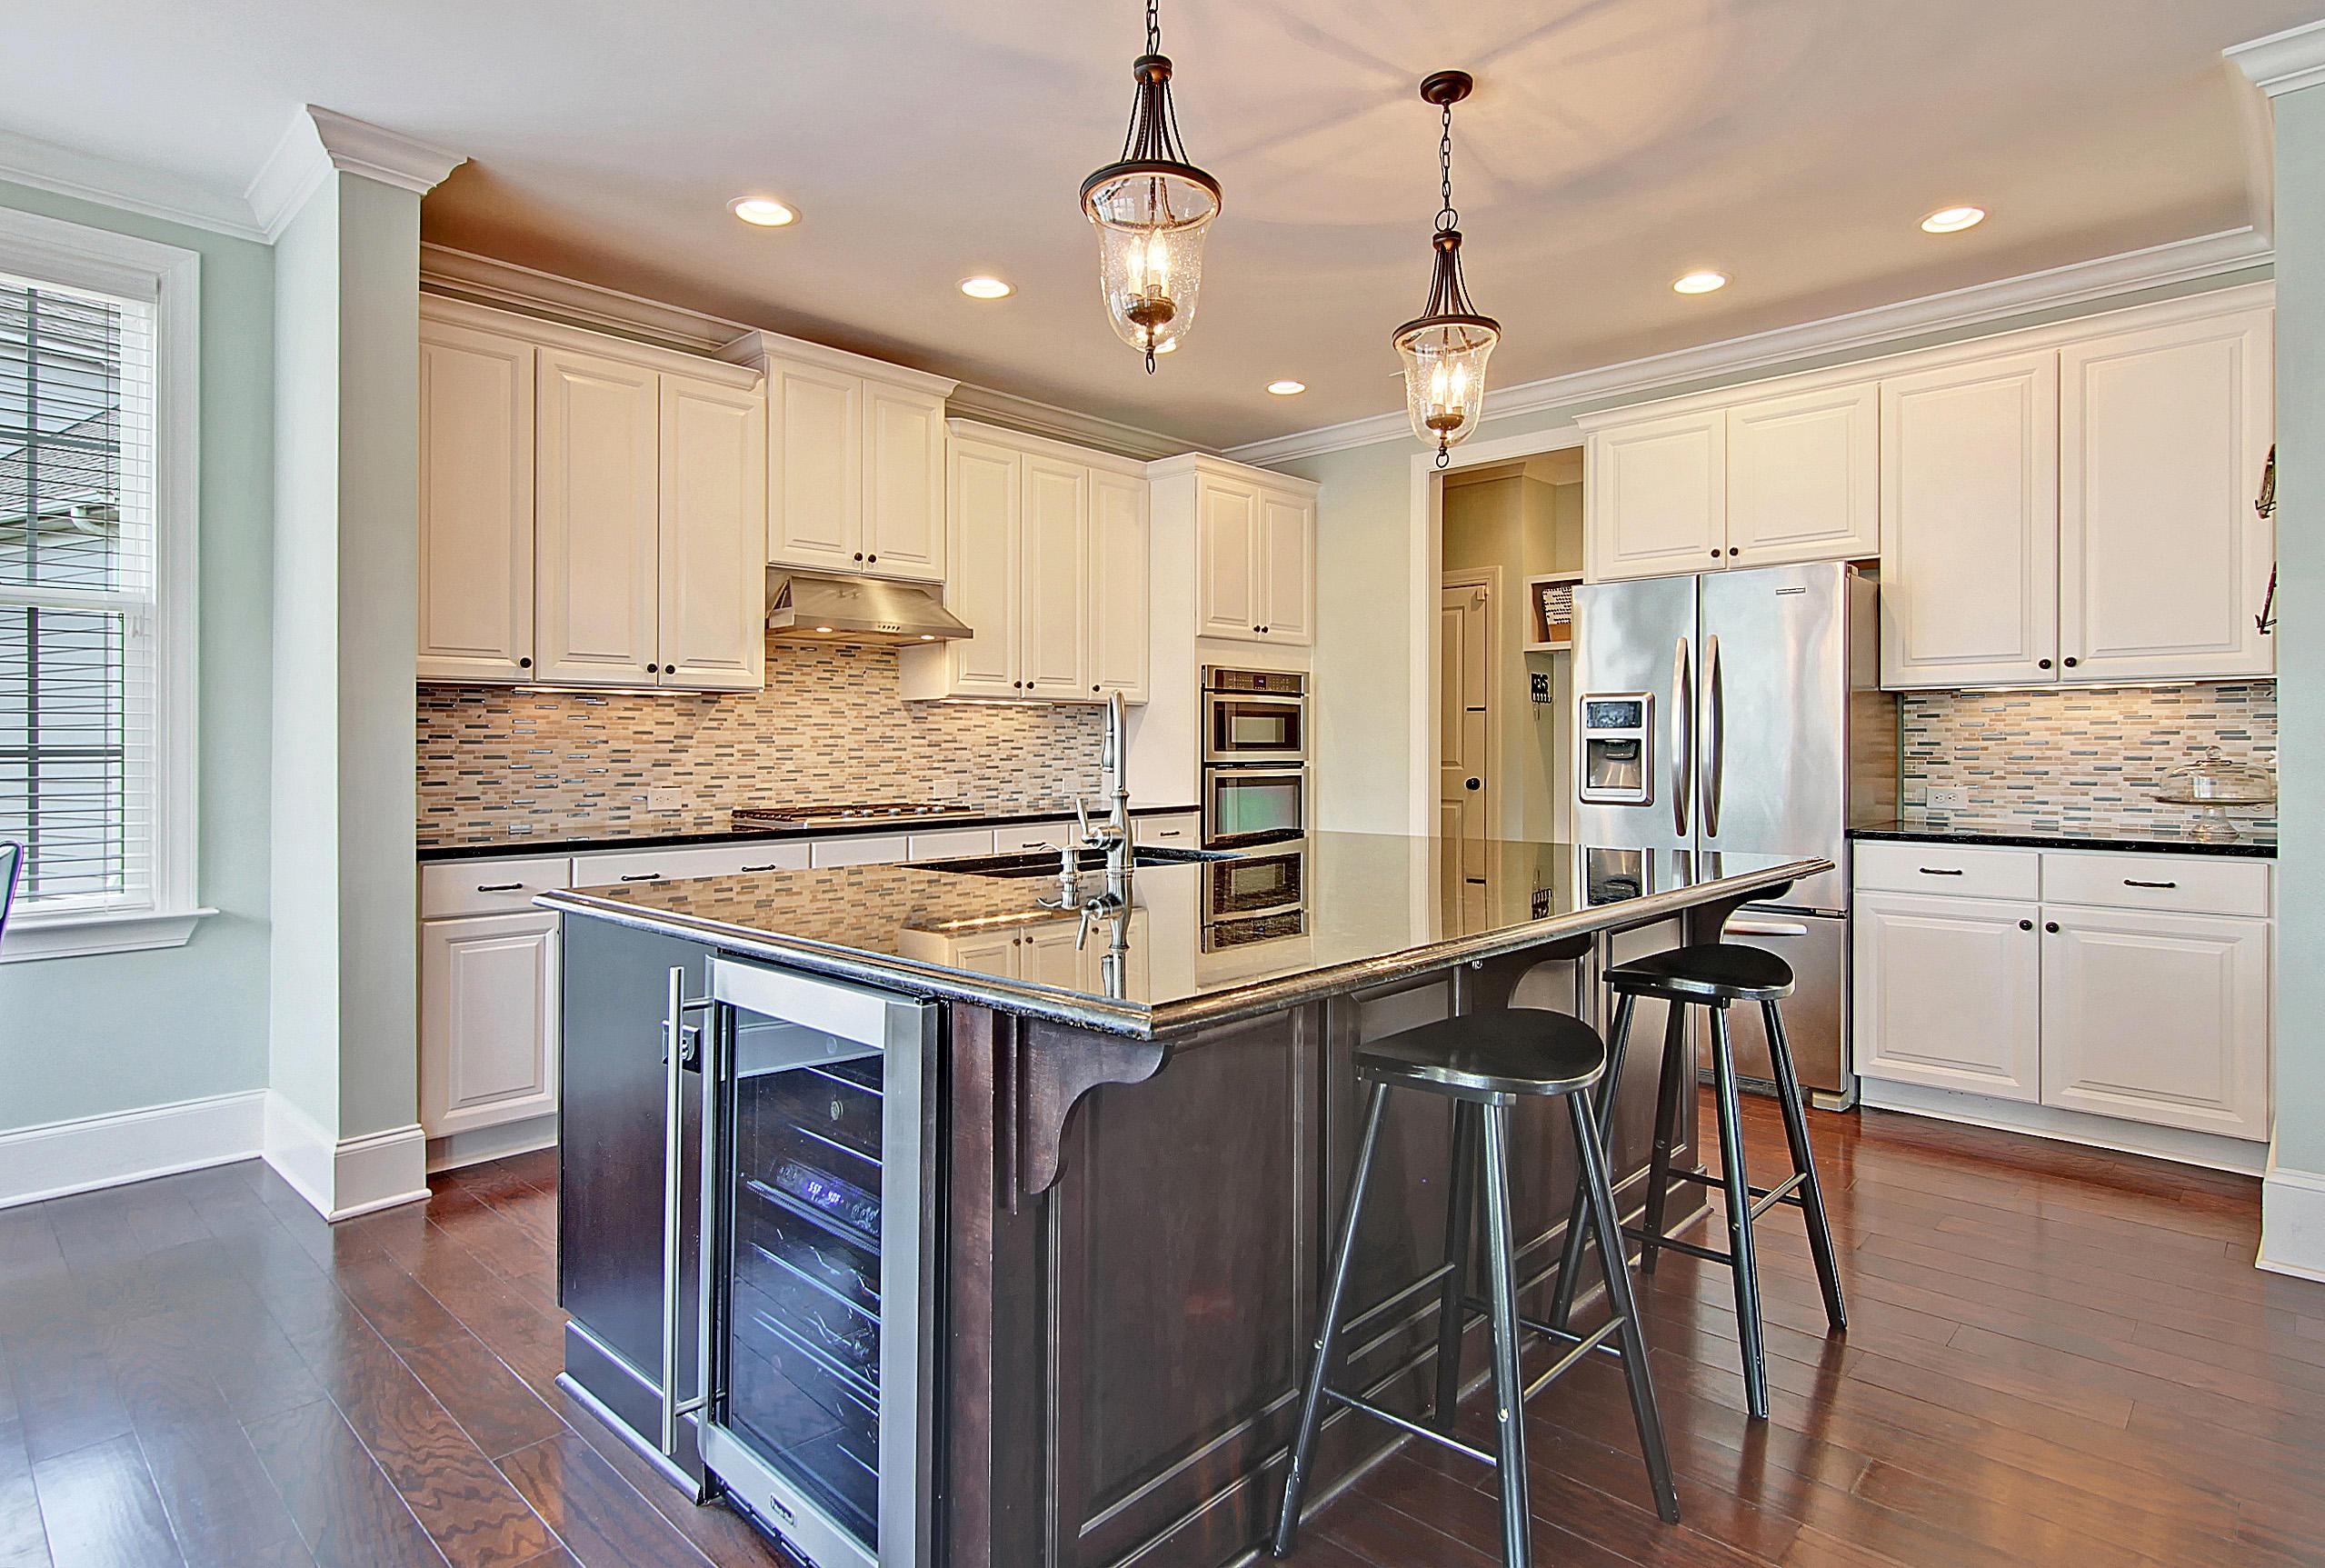 Dunes West Homes For Sale - 1332 Whisker Pole, Mount Pleasant, SC - 7